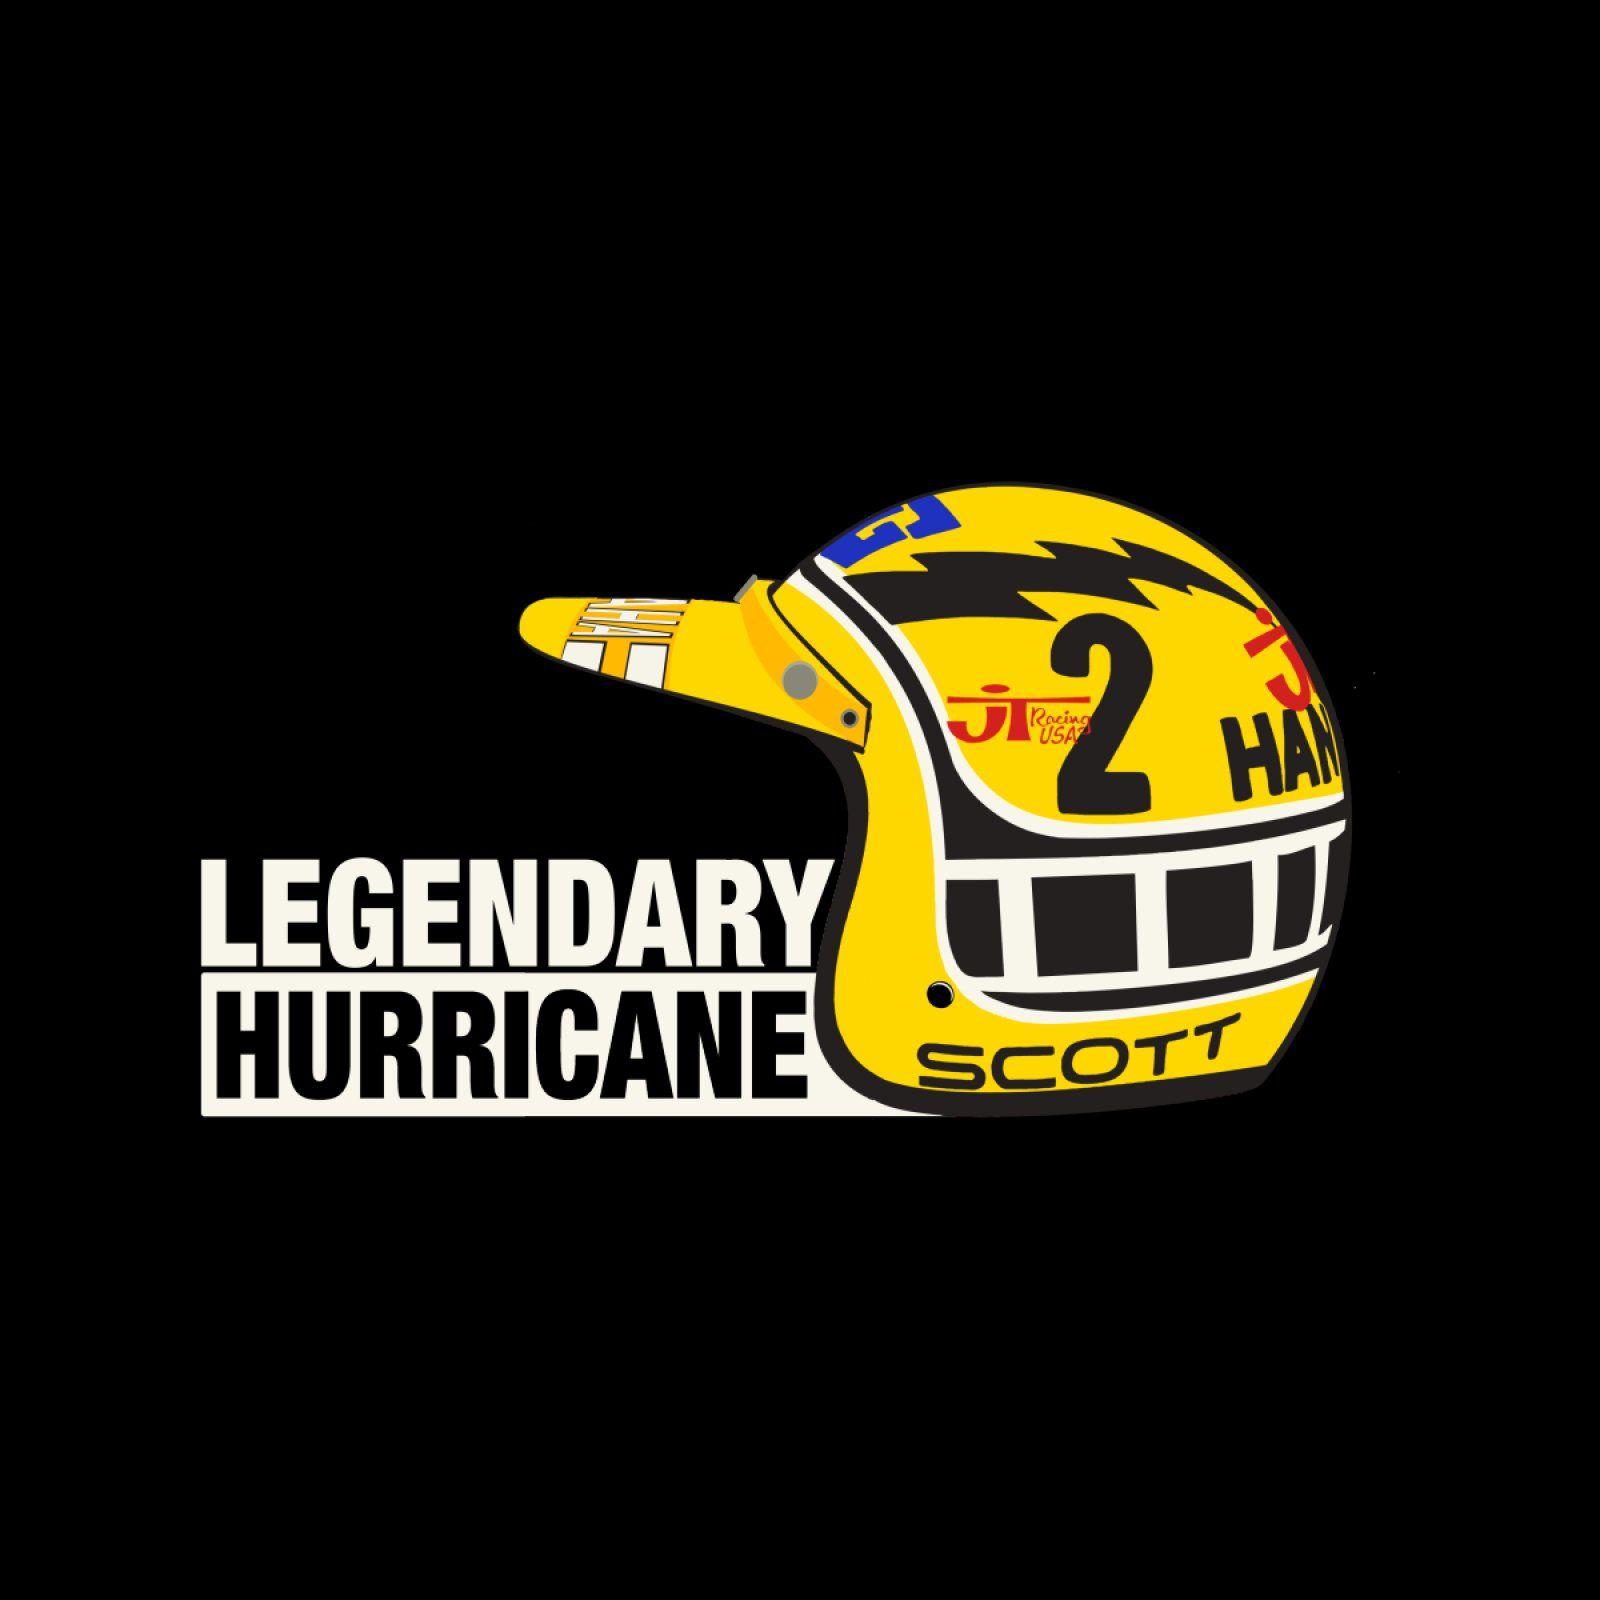 Bob Hurricane Hannah Legends Of Motocross Helmet Design 2 Motocross Helmets Helmet Design Motocross